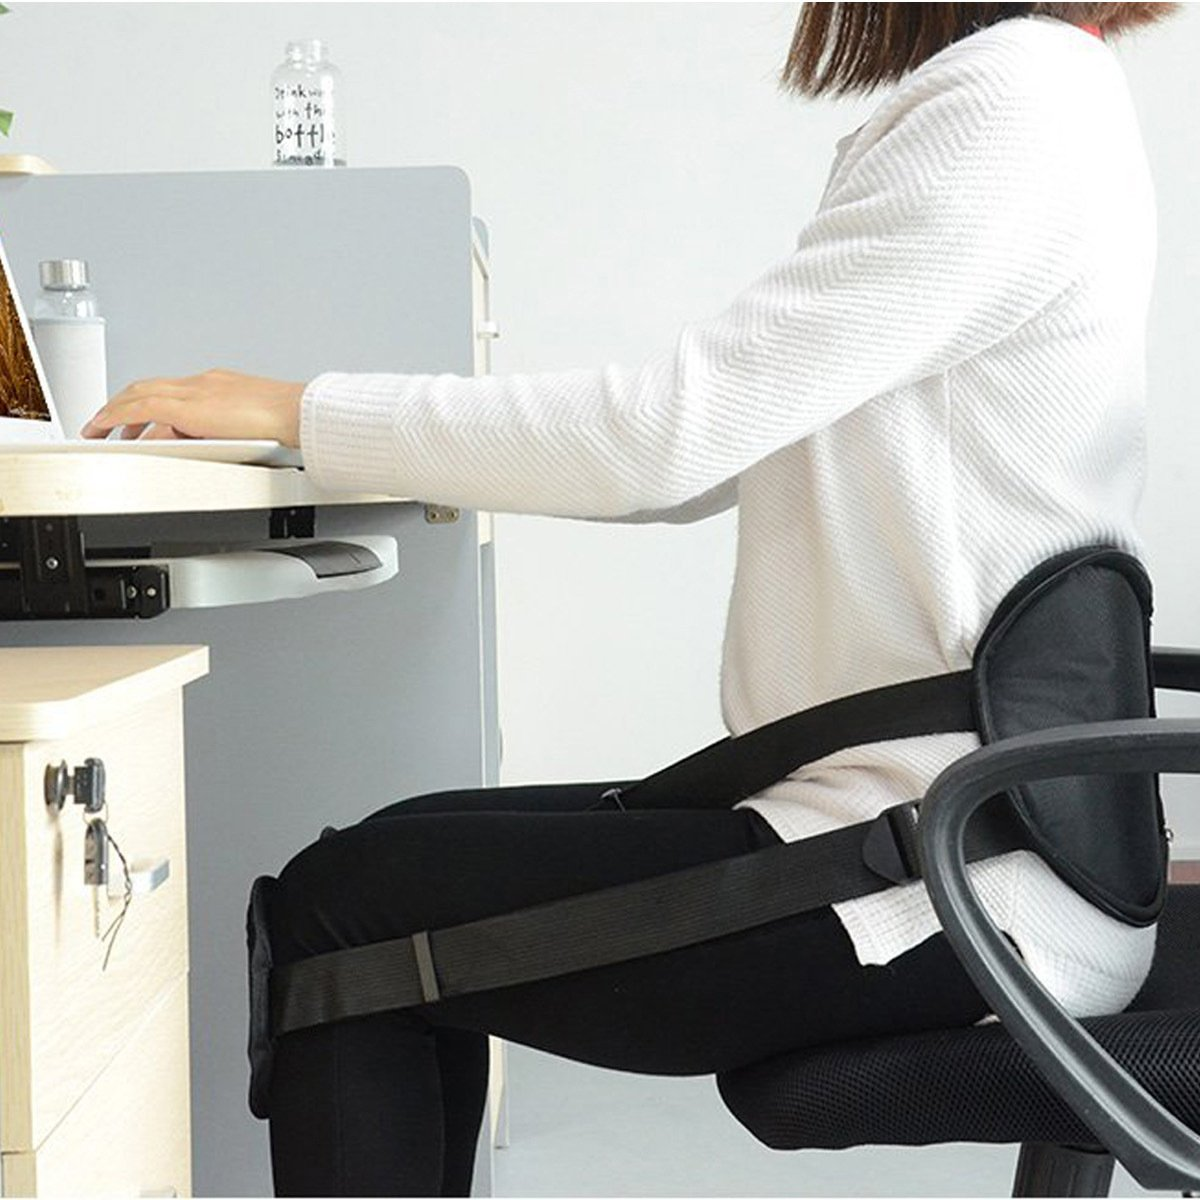 Ueasy Adjustable Back Posture Corrector Brace Clavicle Brace Portable Correct Back Posture for Correction Posture Enhance Temperament by Ueasy (Image #3)